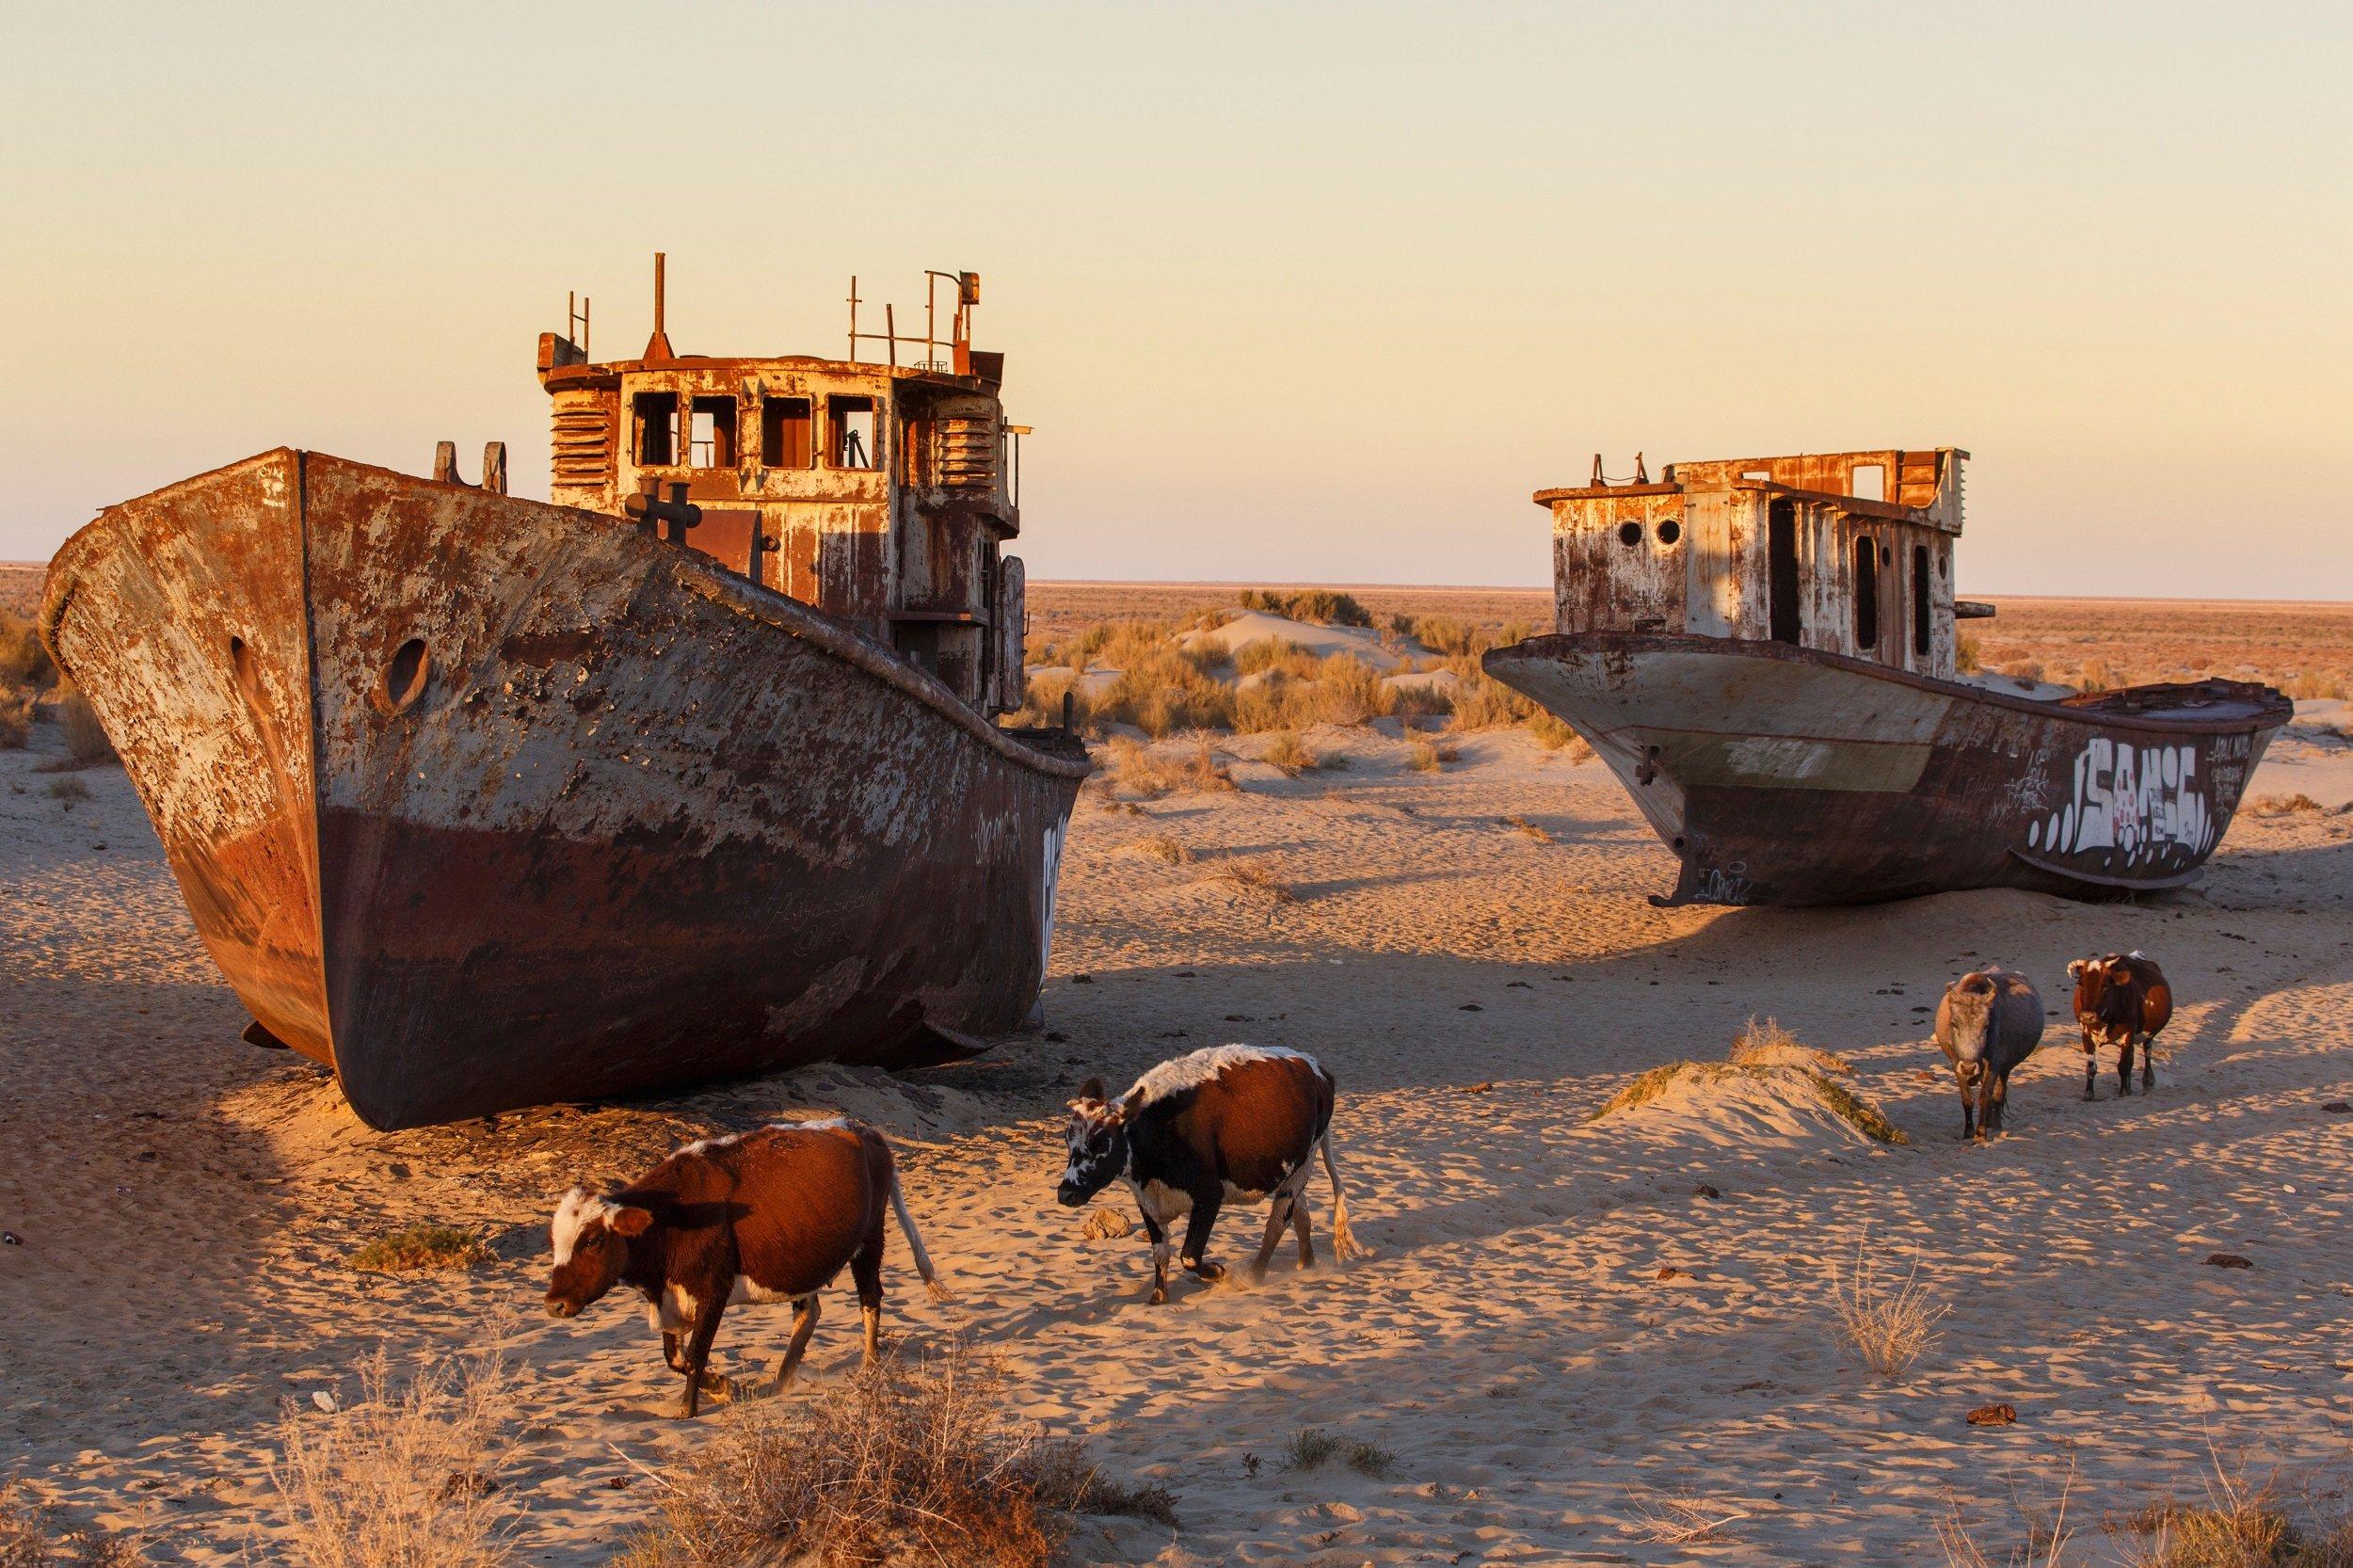 Cows walk through the ship graveyard near the former port of Moynaq on the Aral Sea, Uzbekistan (image: Alamy)